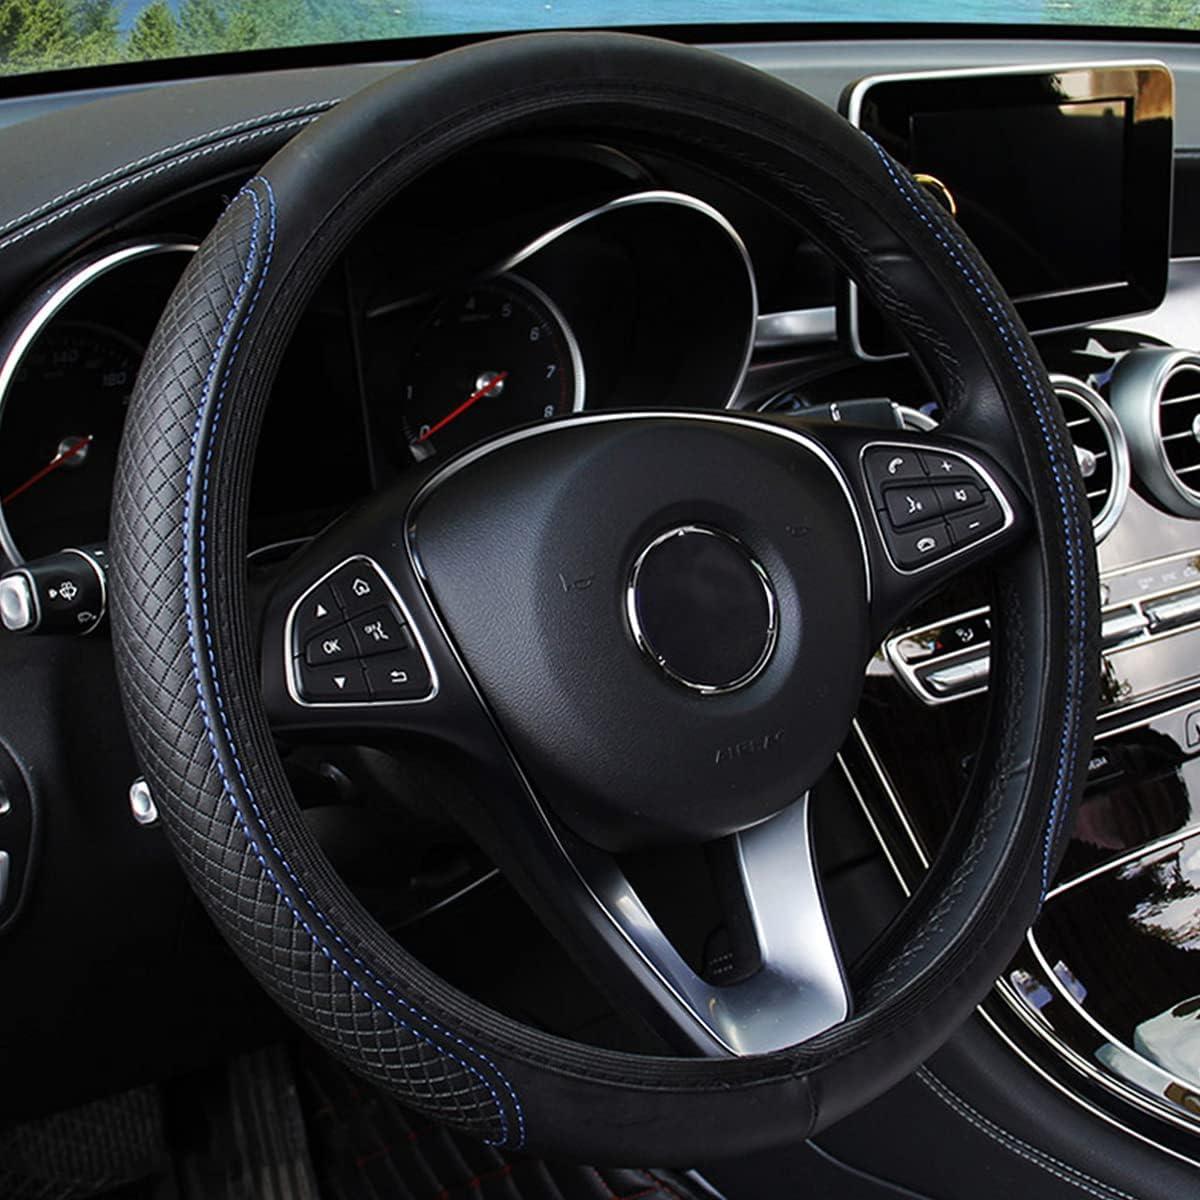 Leather Car Steering Wheel Cover, Elastic, Breathable Anti-Slip, Universal 15 inch, Steering Wheel Cover for Men Women (Black/Blue)